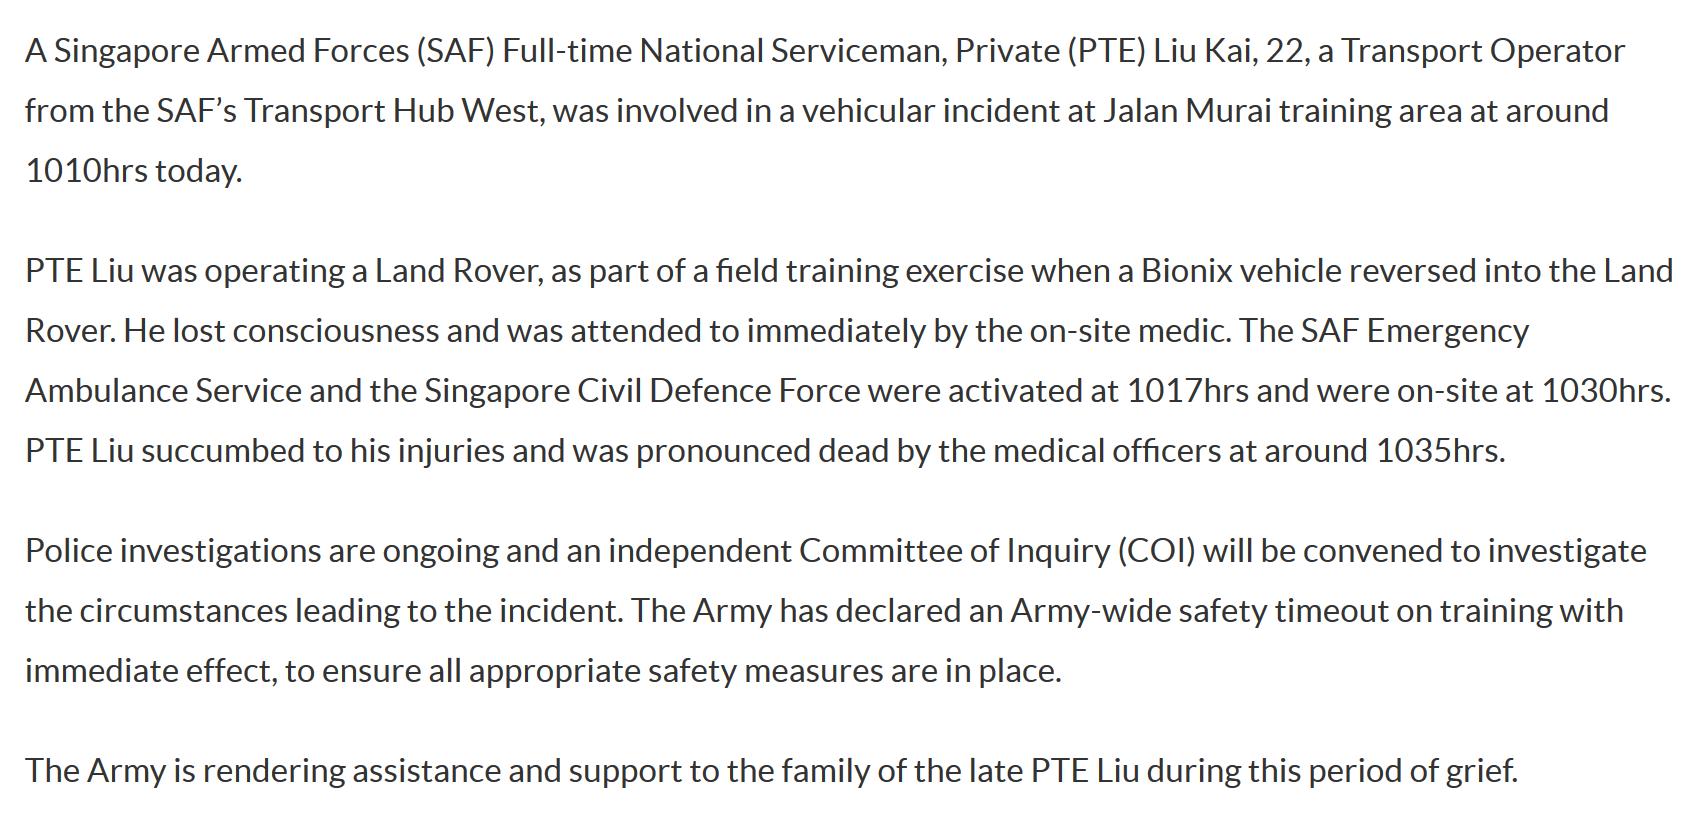 redwire singapore bionix killing liu kai